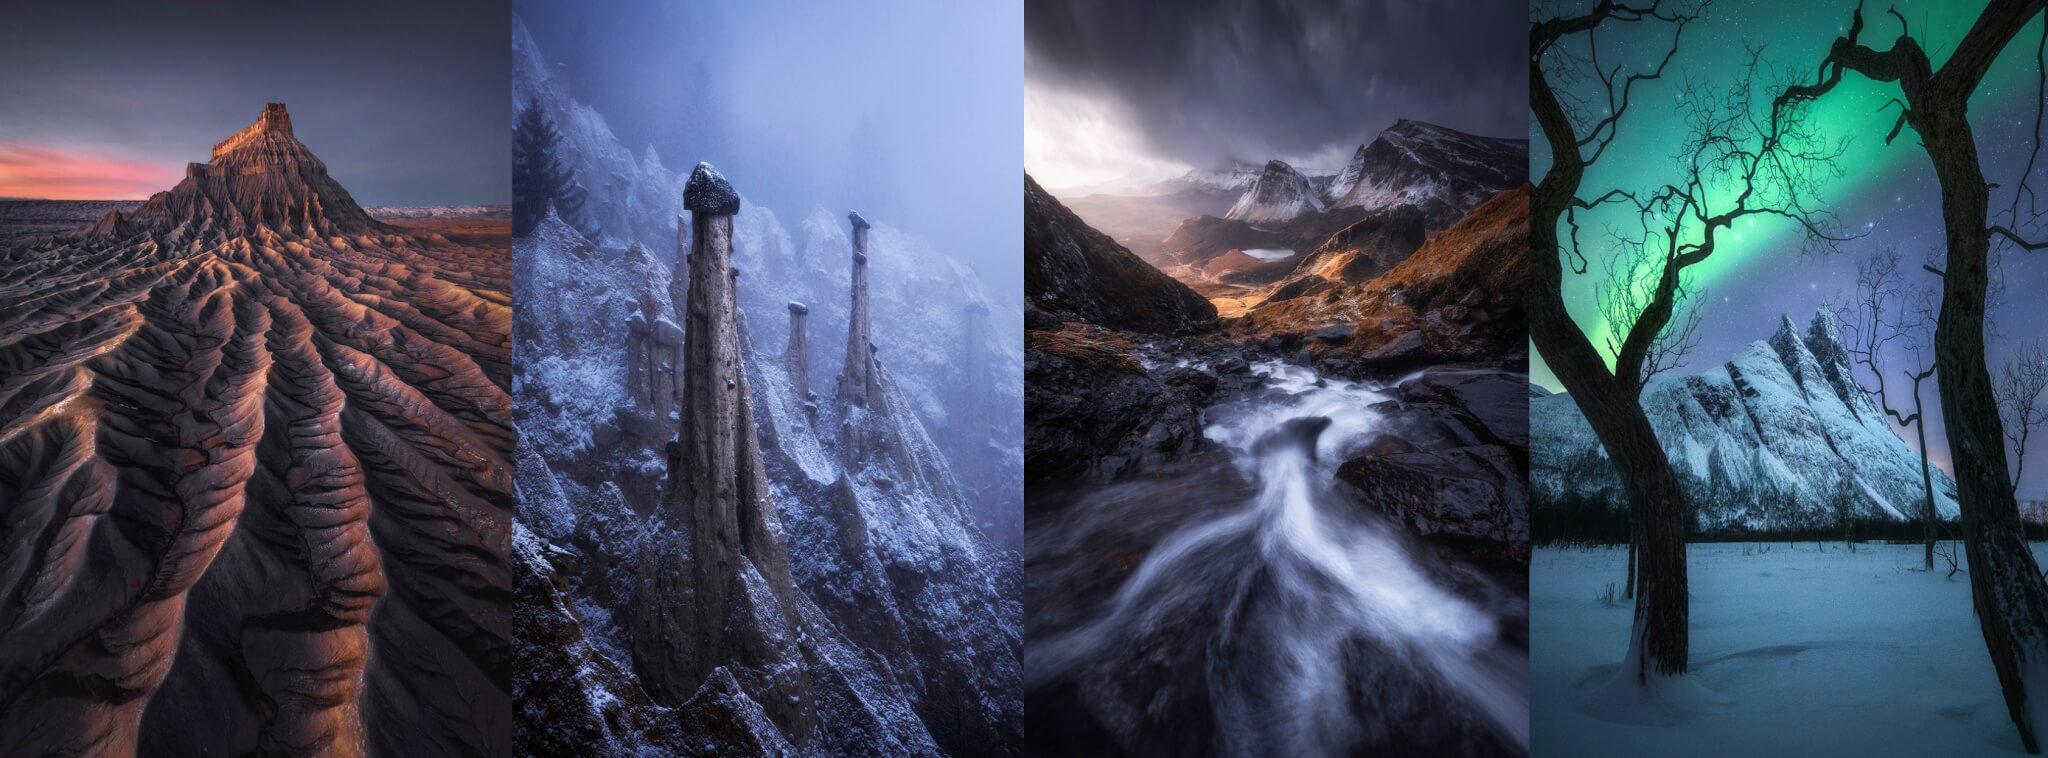 Kelvin憑着四張分別在美國、意大利、蘇格蘭及挪威拍攝的照片,奪得2020國際年度風景攝影師全球冠軍。